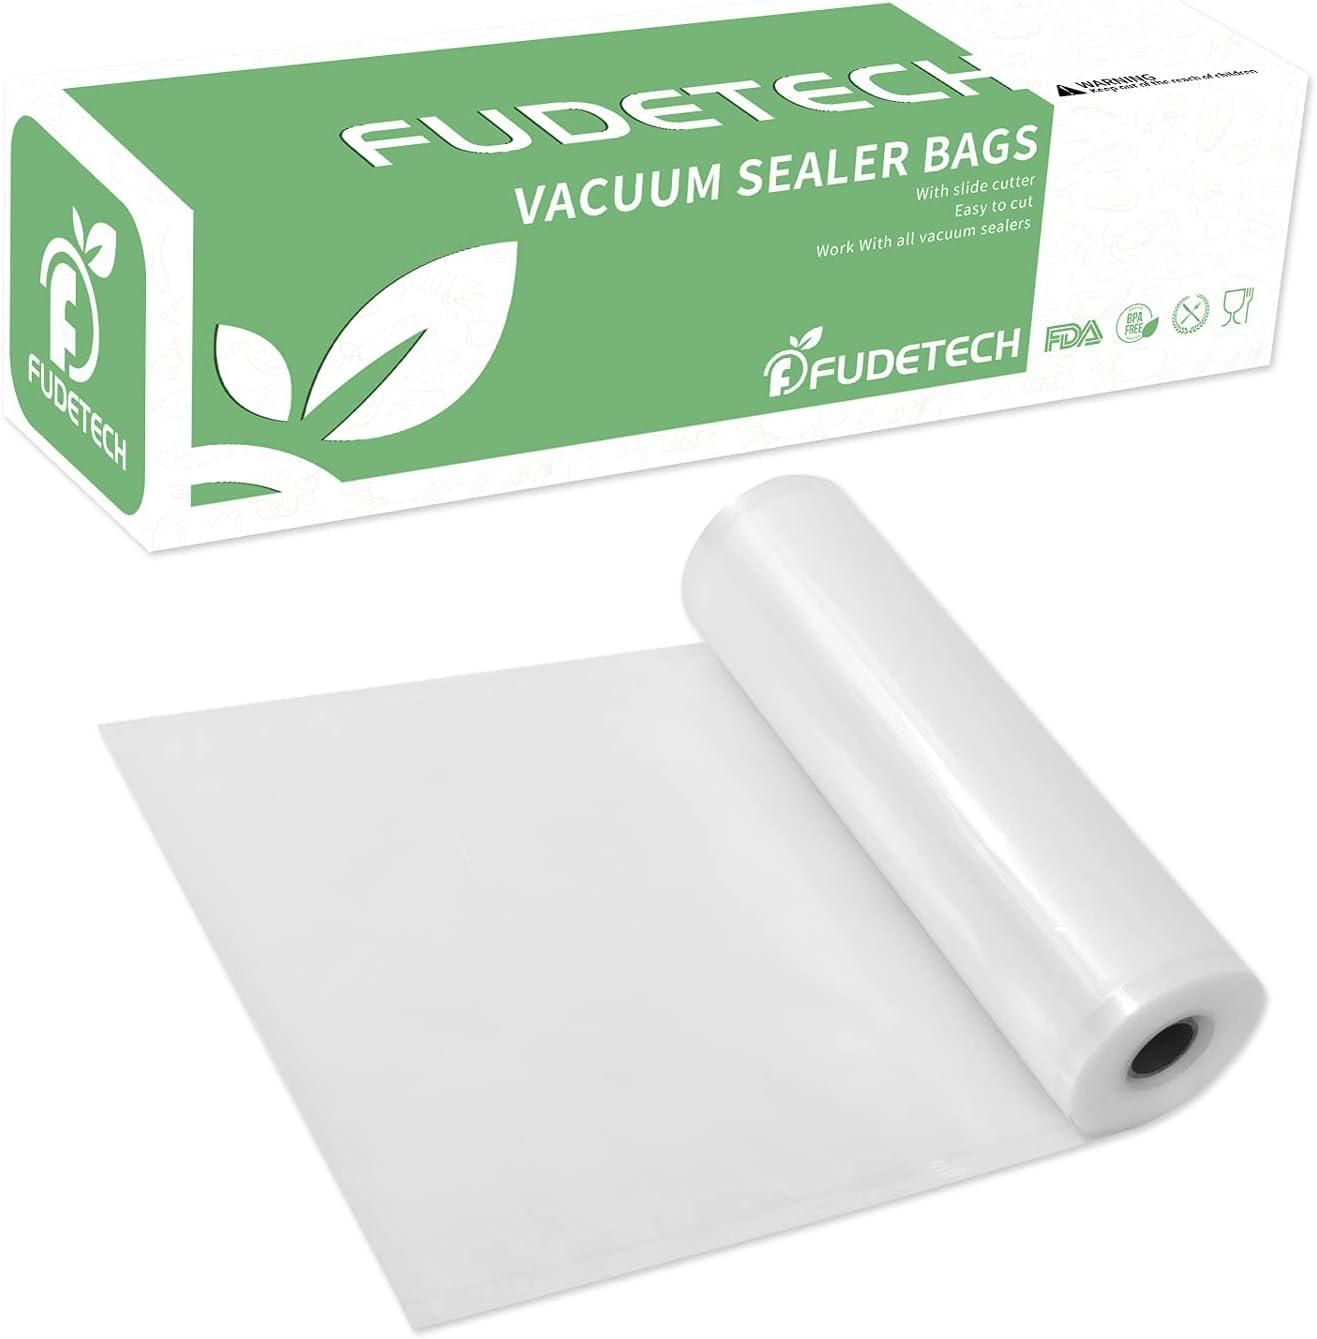 F Fudetech Vacuum Sealer BagsRolls 11